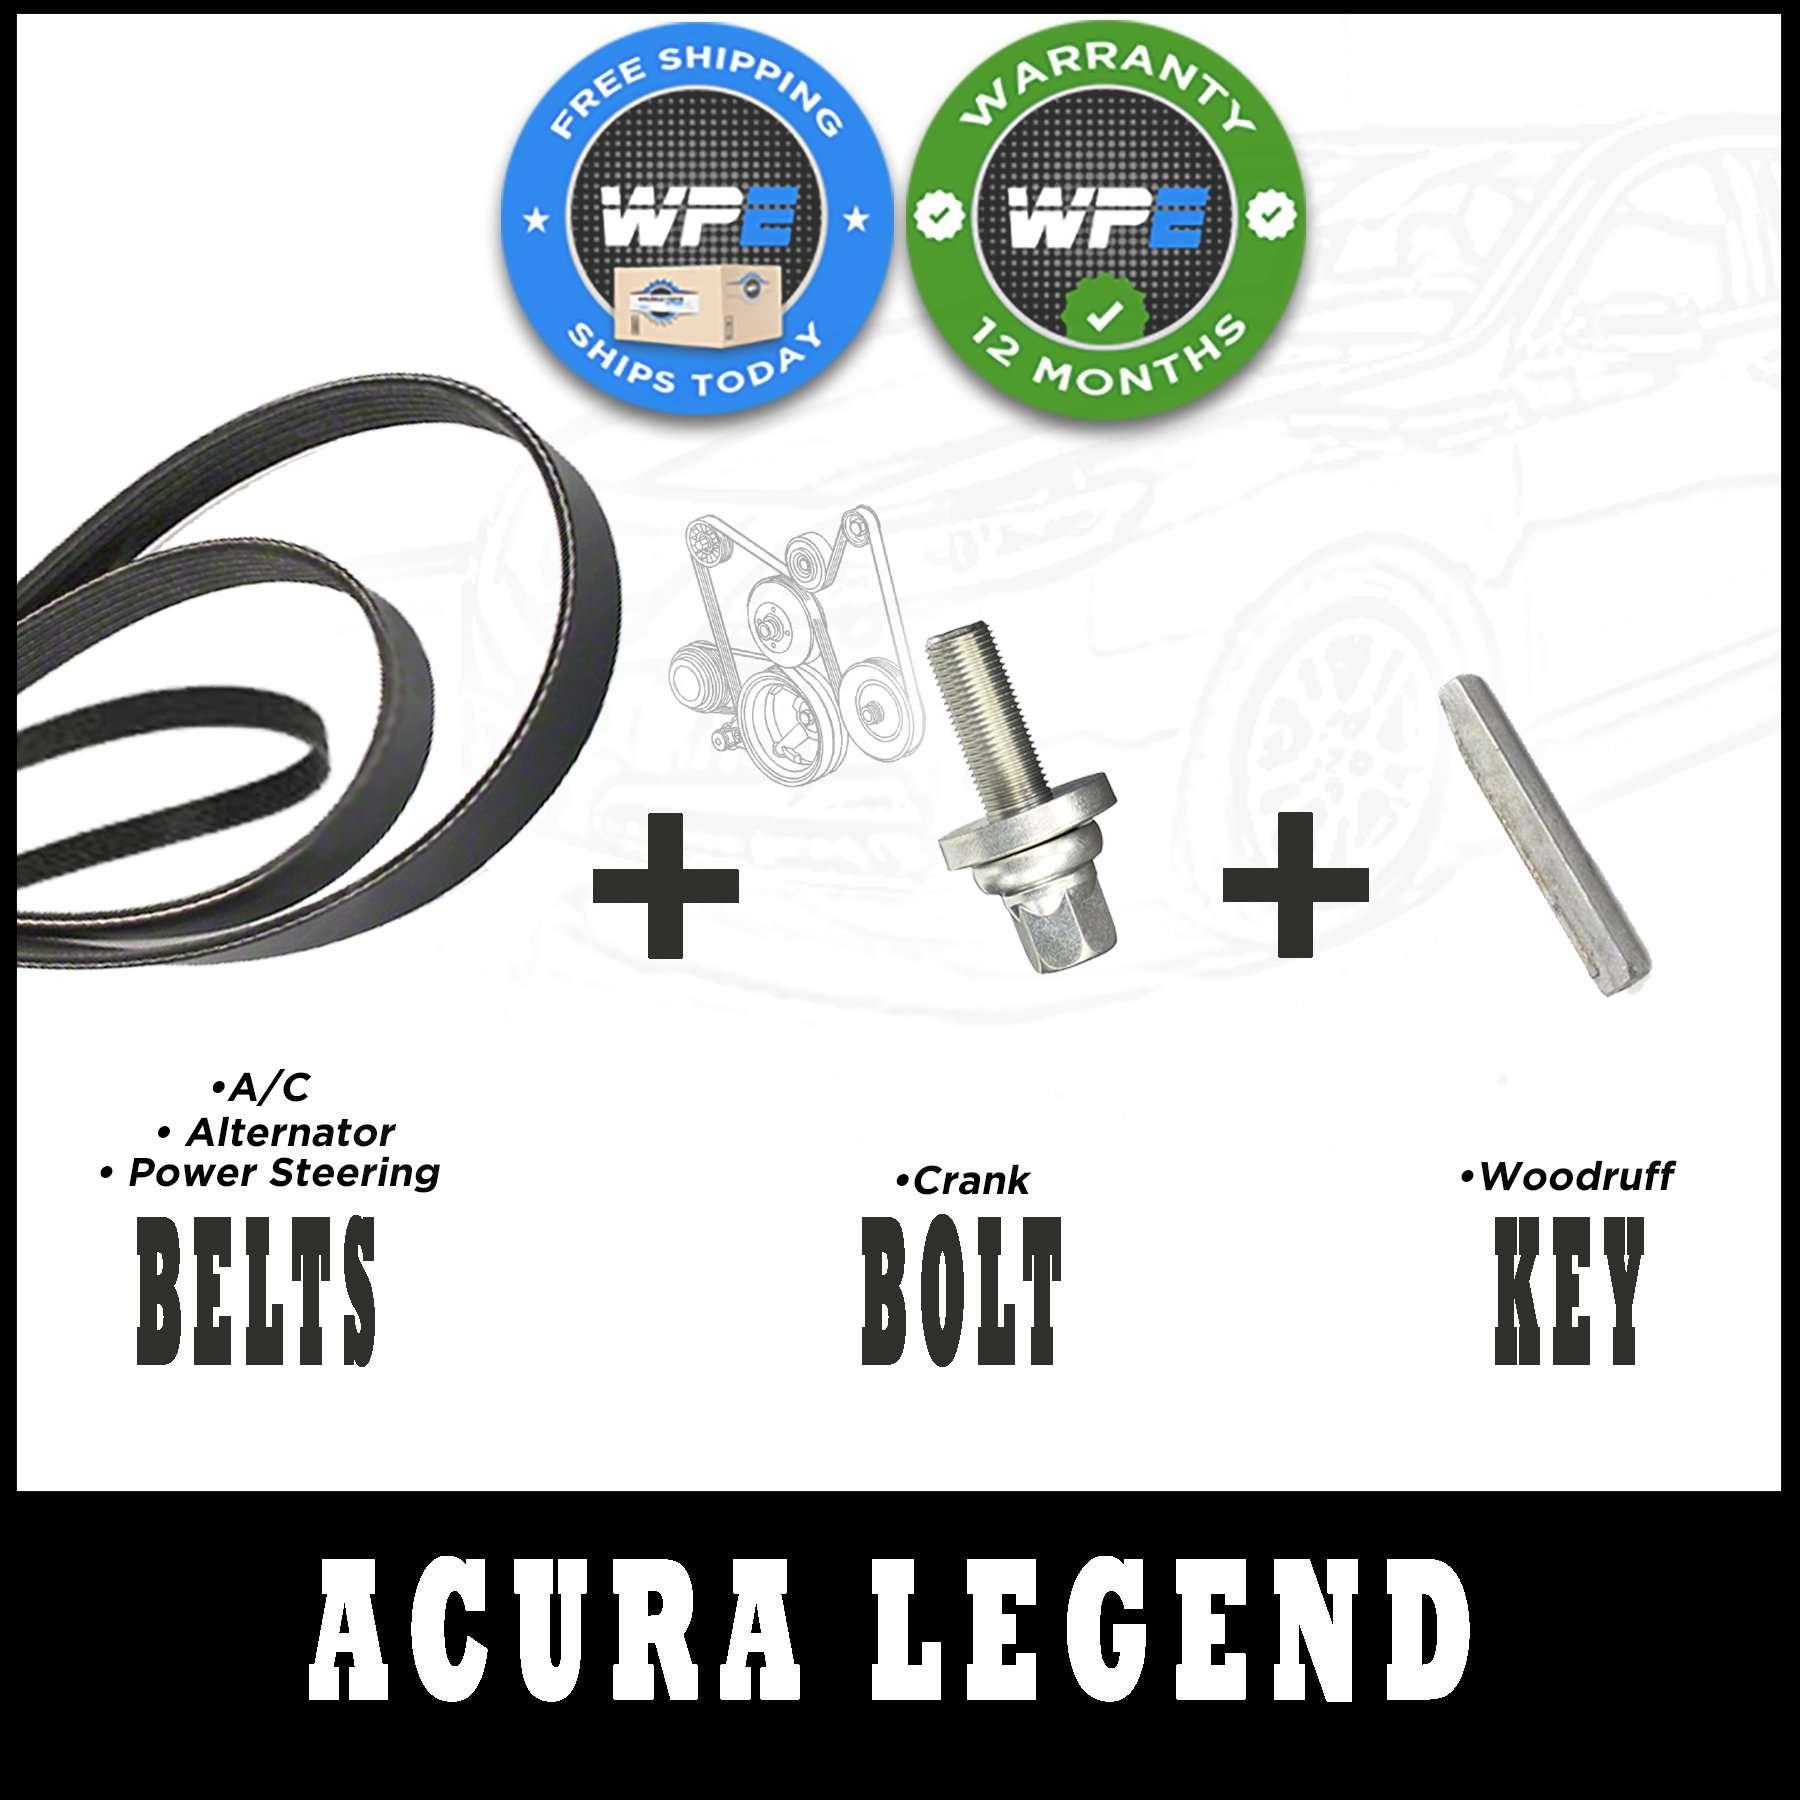 Acura Legend Balancer Replacement Kit 1991